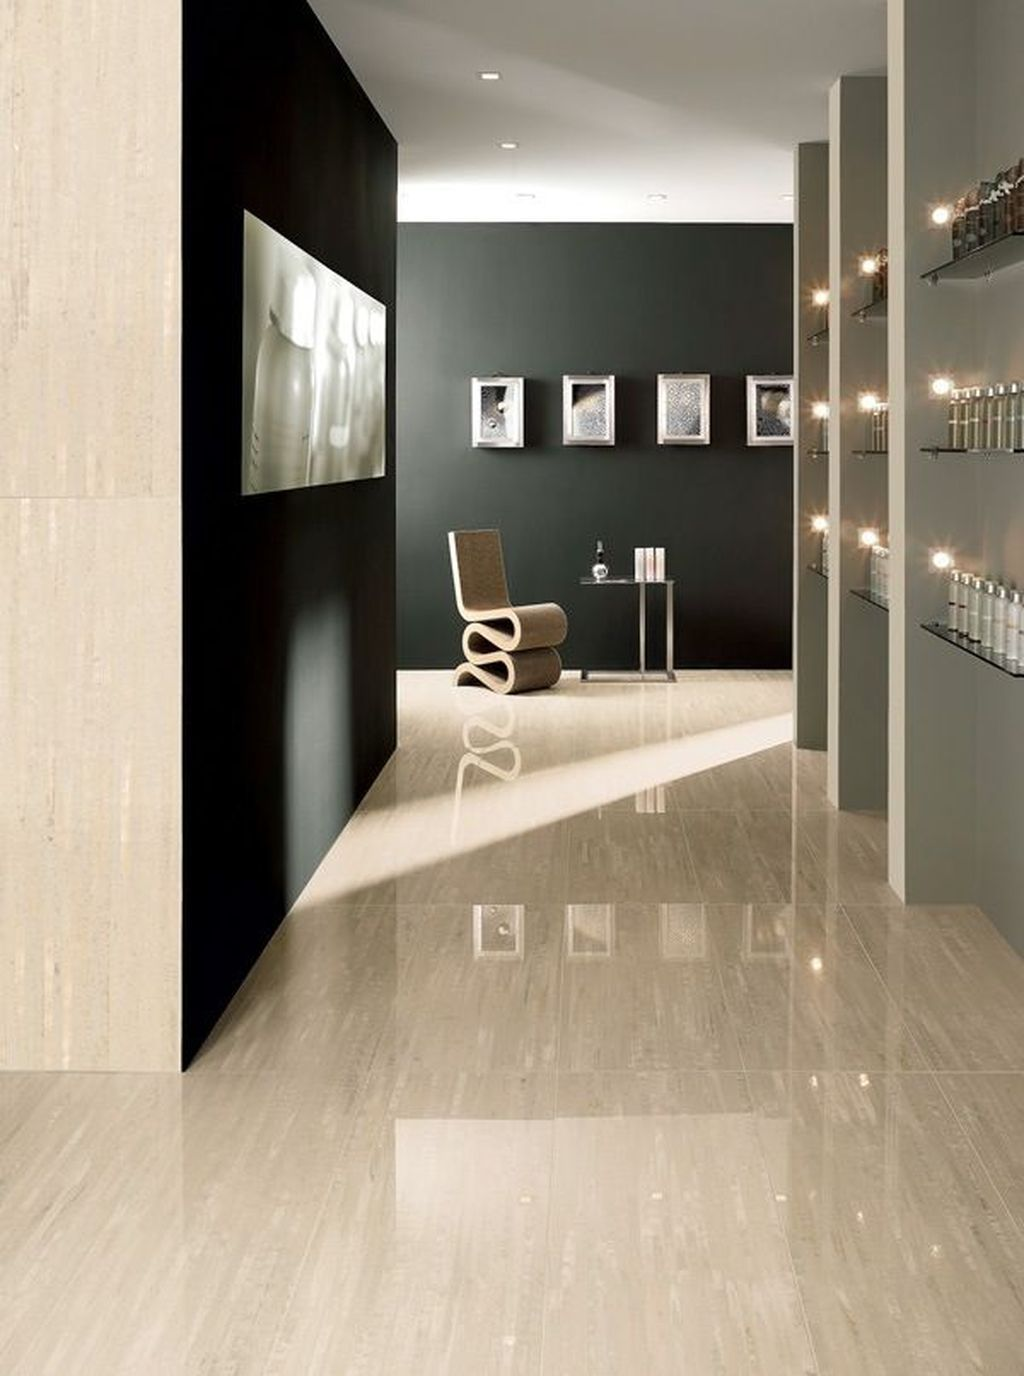 12 Luxurious Living Room Design Ideas With Floor Granite Tile